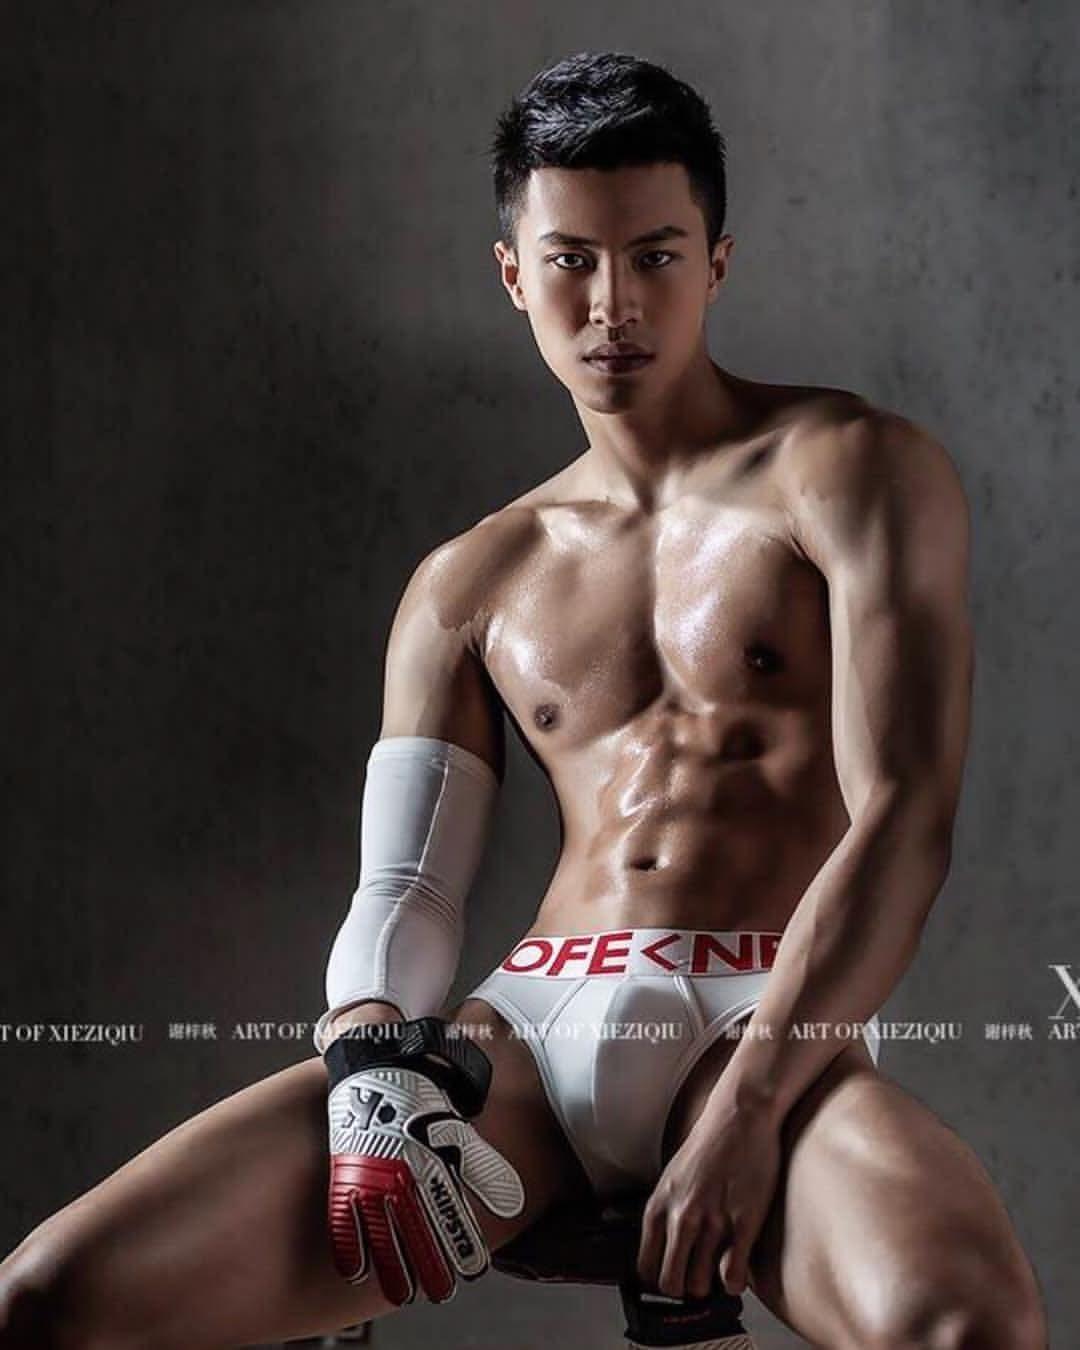 asian-male-underwear-modelstures-not-legal-nudist